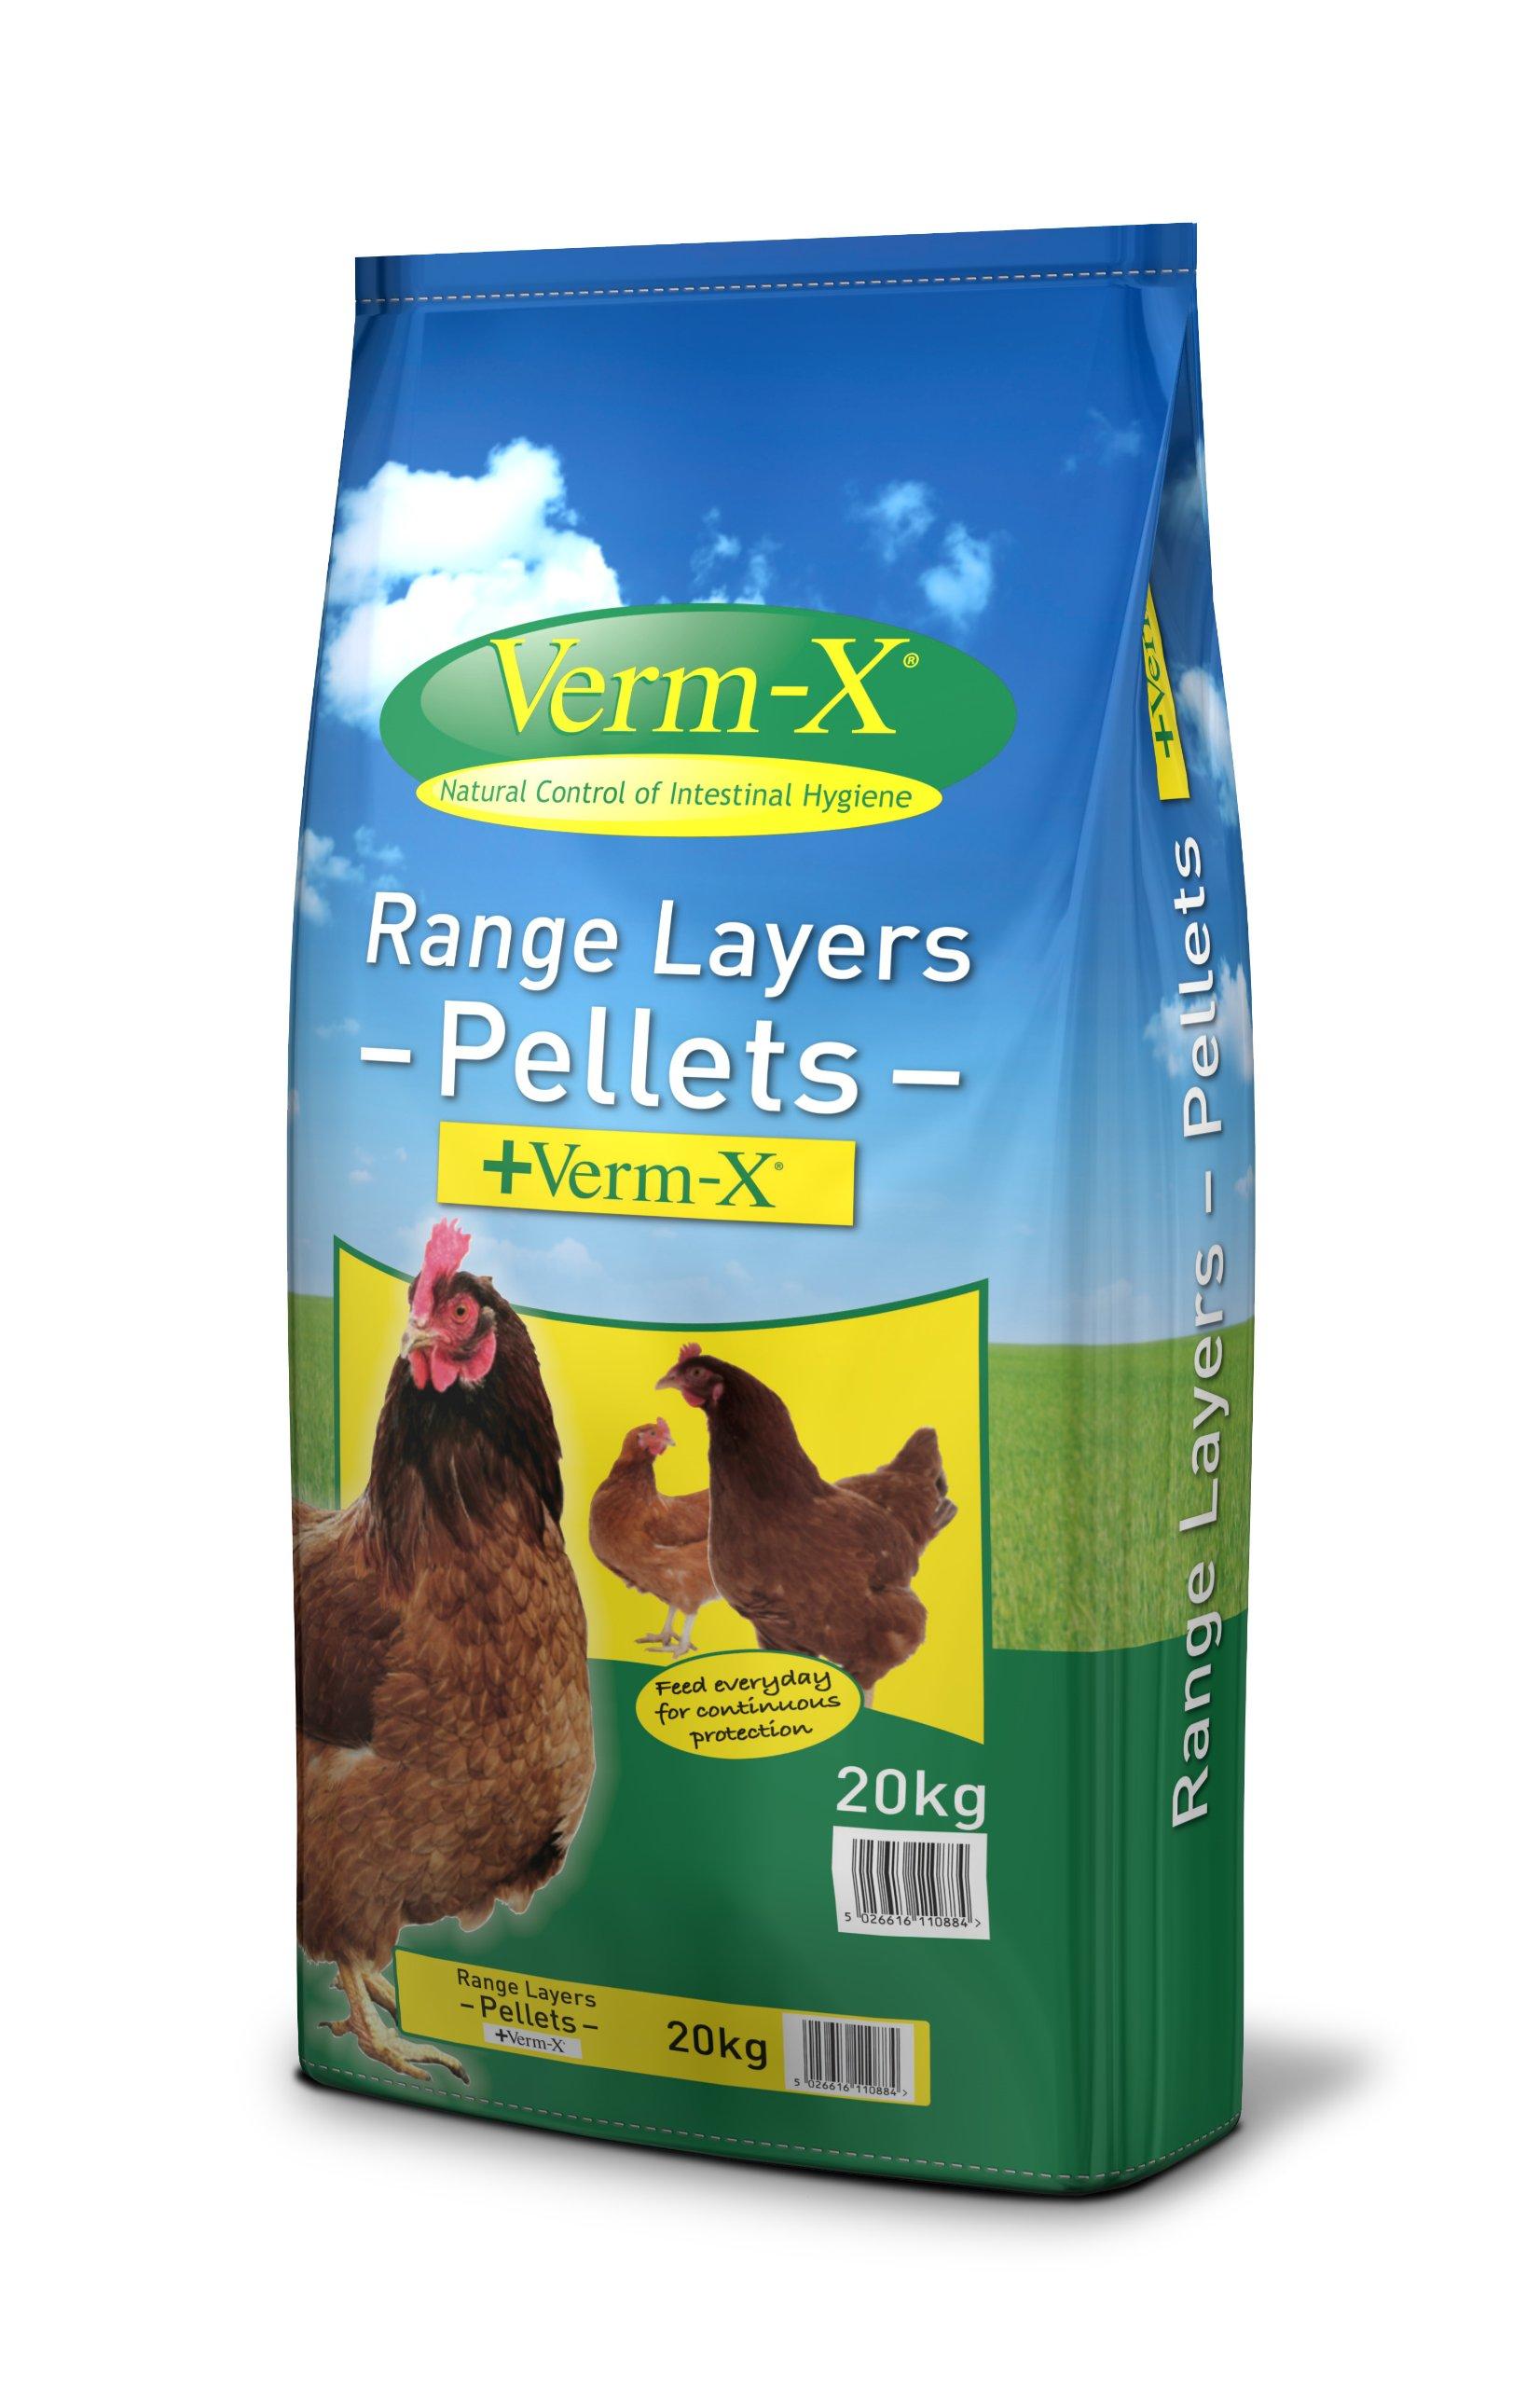 Copdock Mill  Copdock Mill Range Layers Pellets Plus Verm X, 20 Kg – Pack of 1